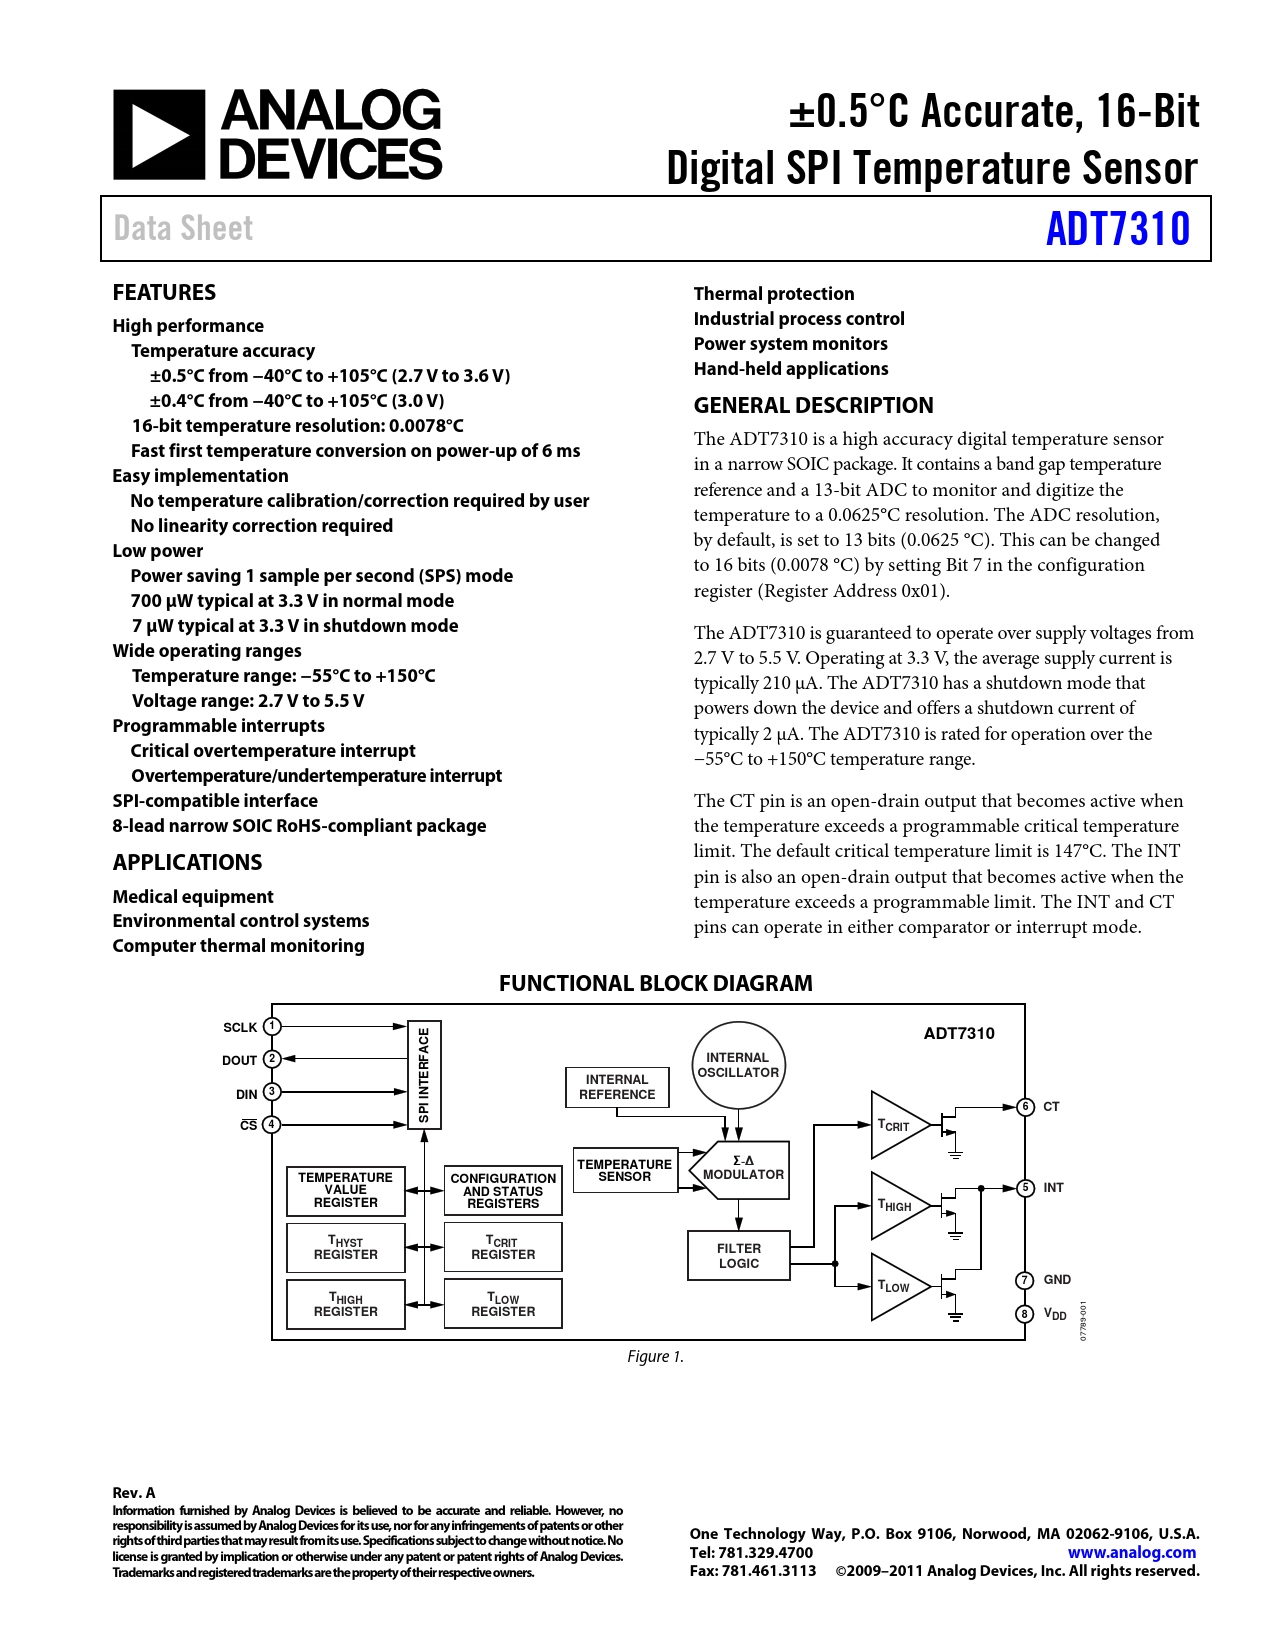 Datasheet ADT7310 Analog Devices, Версия: A